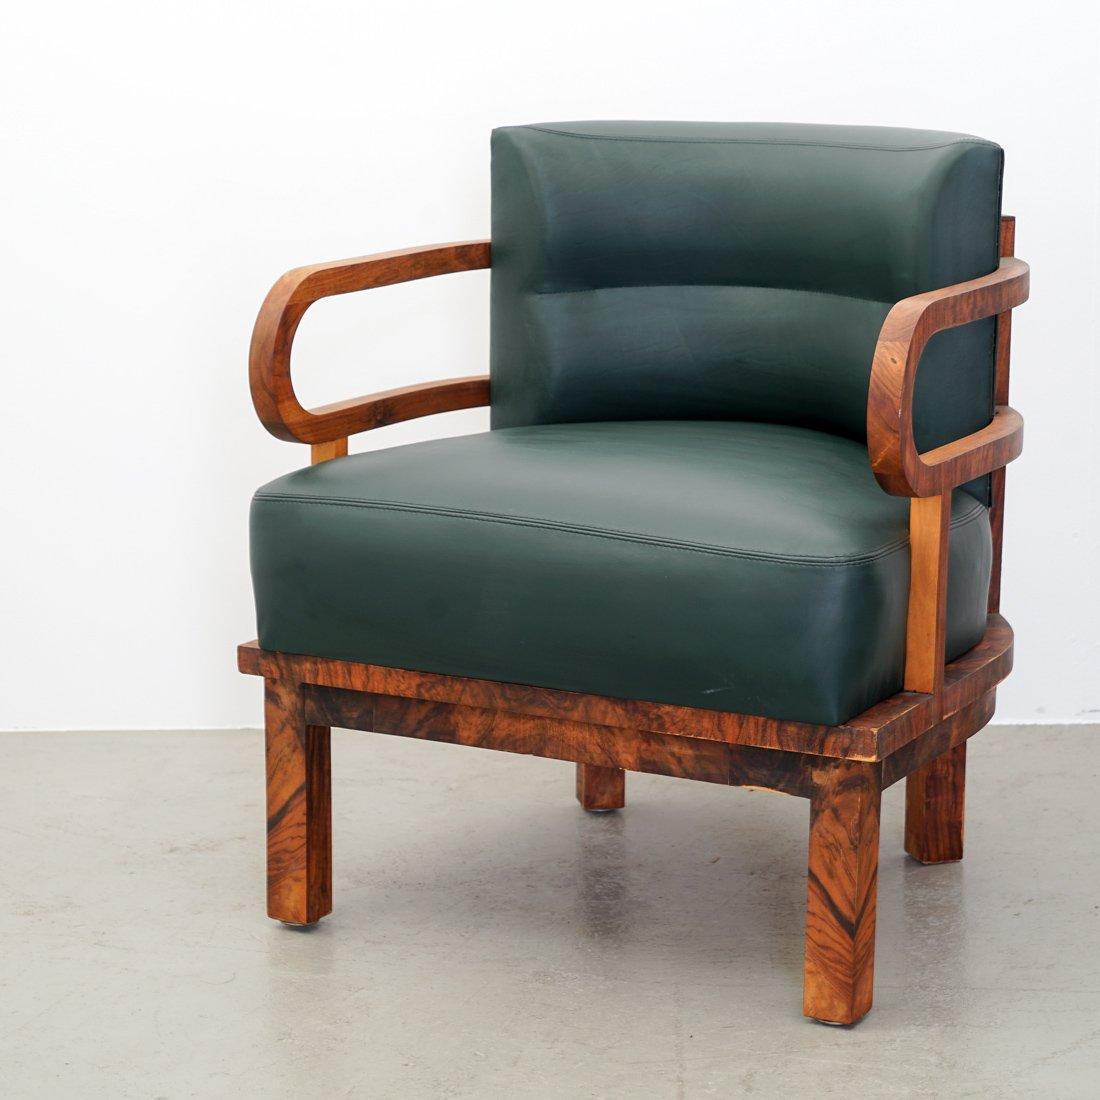 art deco sessel 1920er bei pamono kaufen. Black Bedroom Furniture Sets. Home Design Ideas